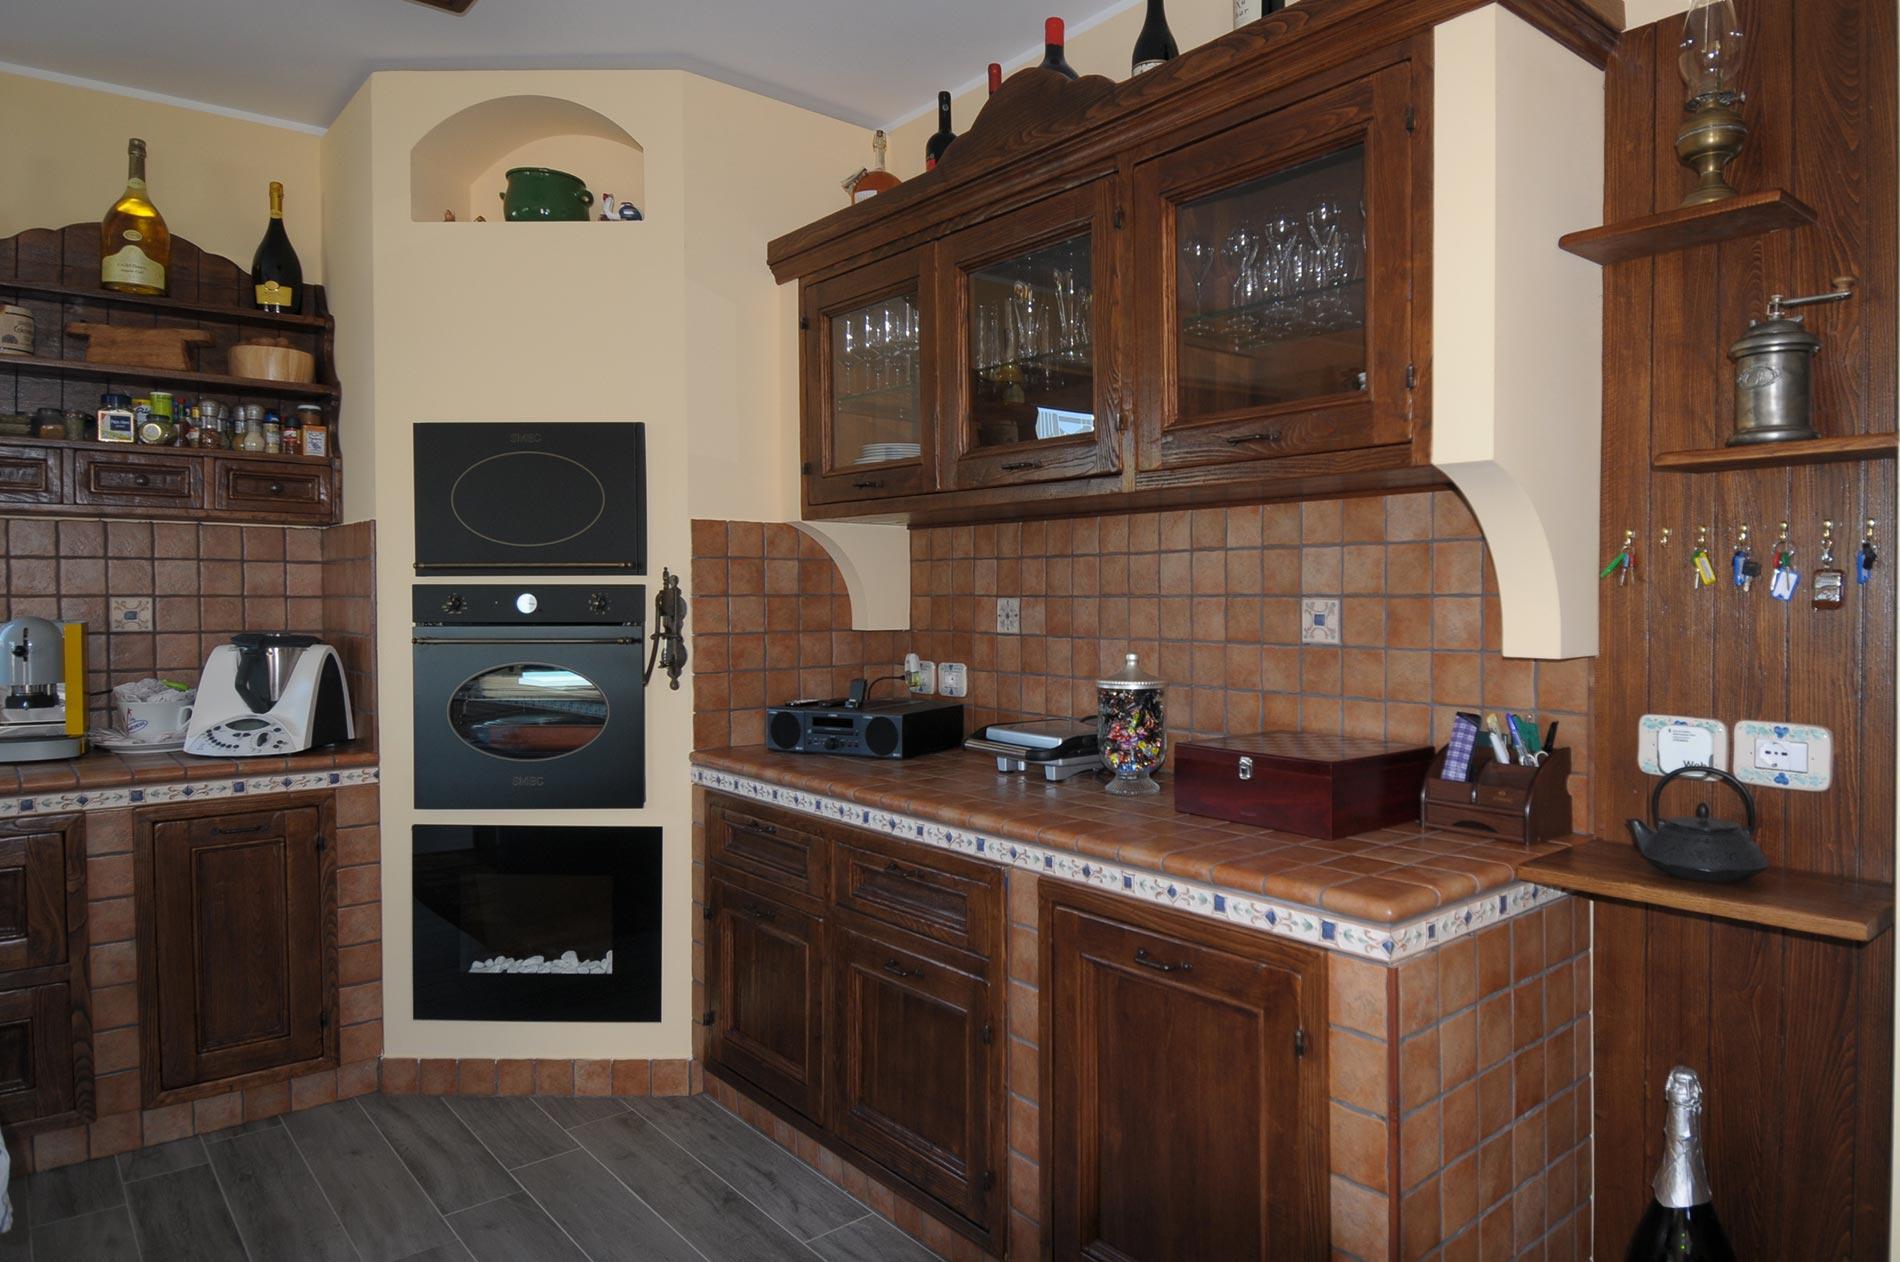 Cucina finta muratura Tosca - Rivenditori cucine Sicilia